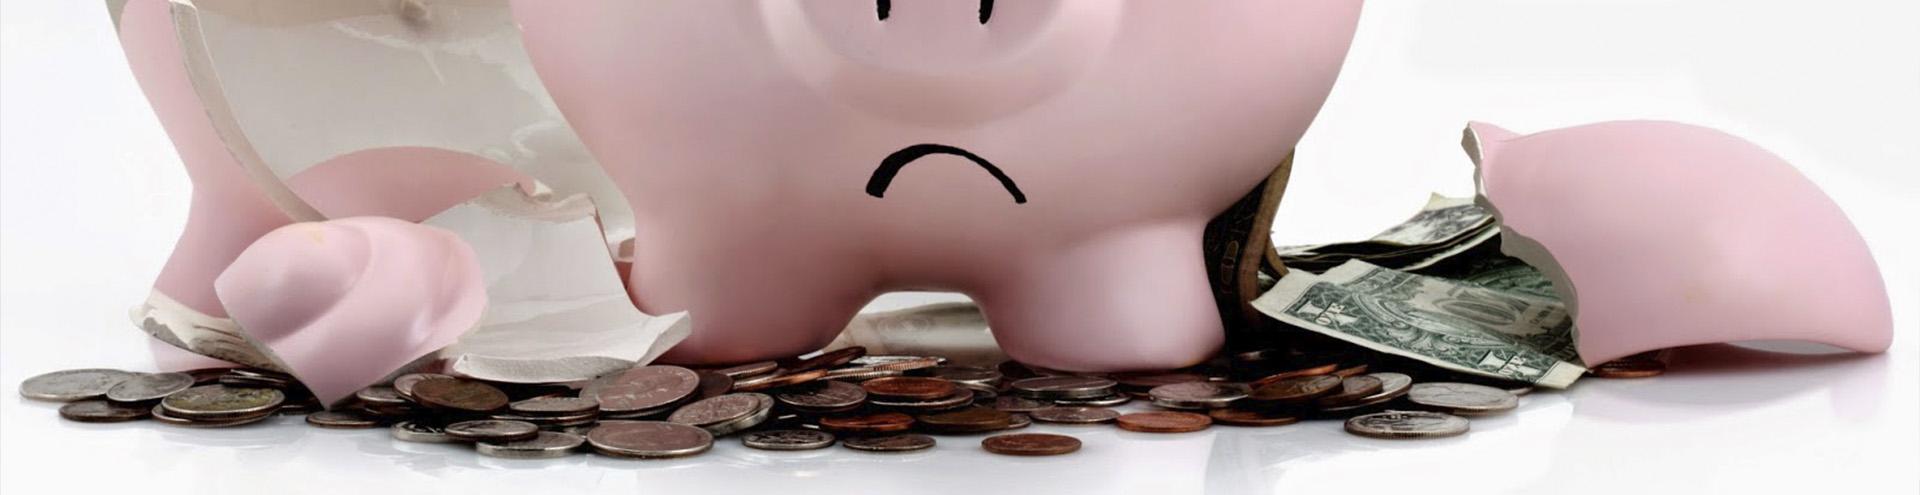 банкротство банка в Оренбурге